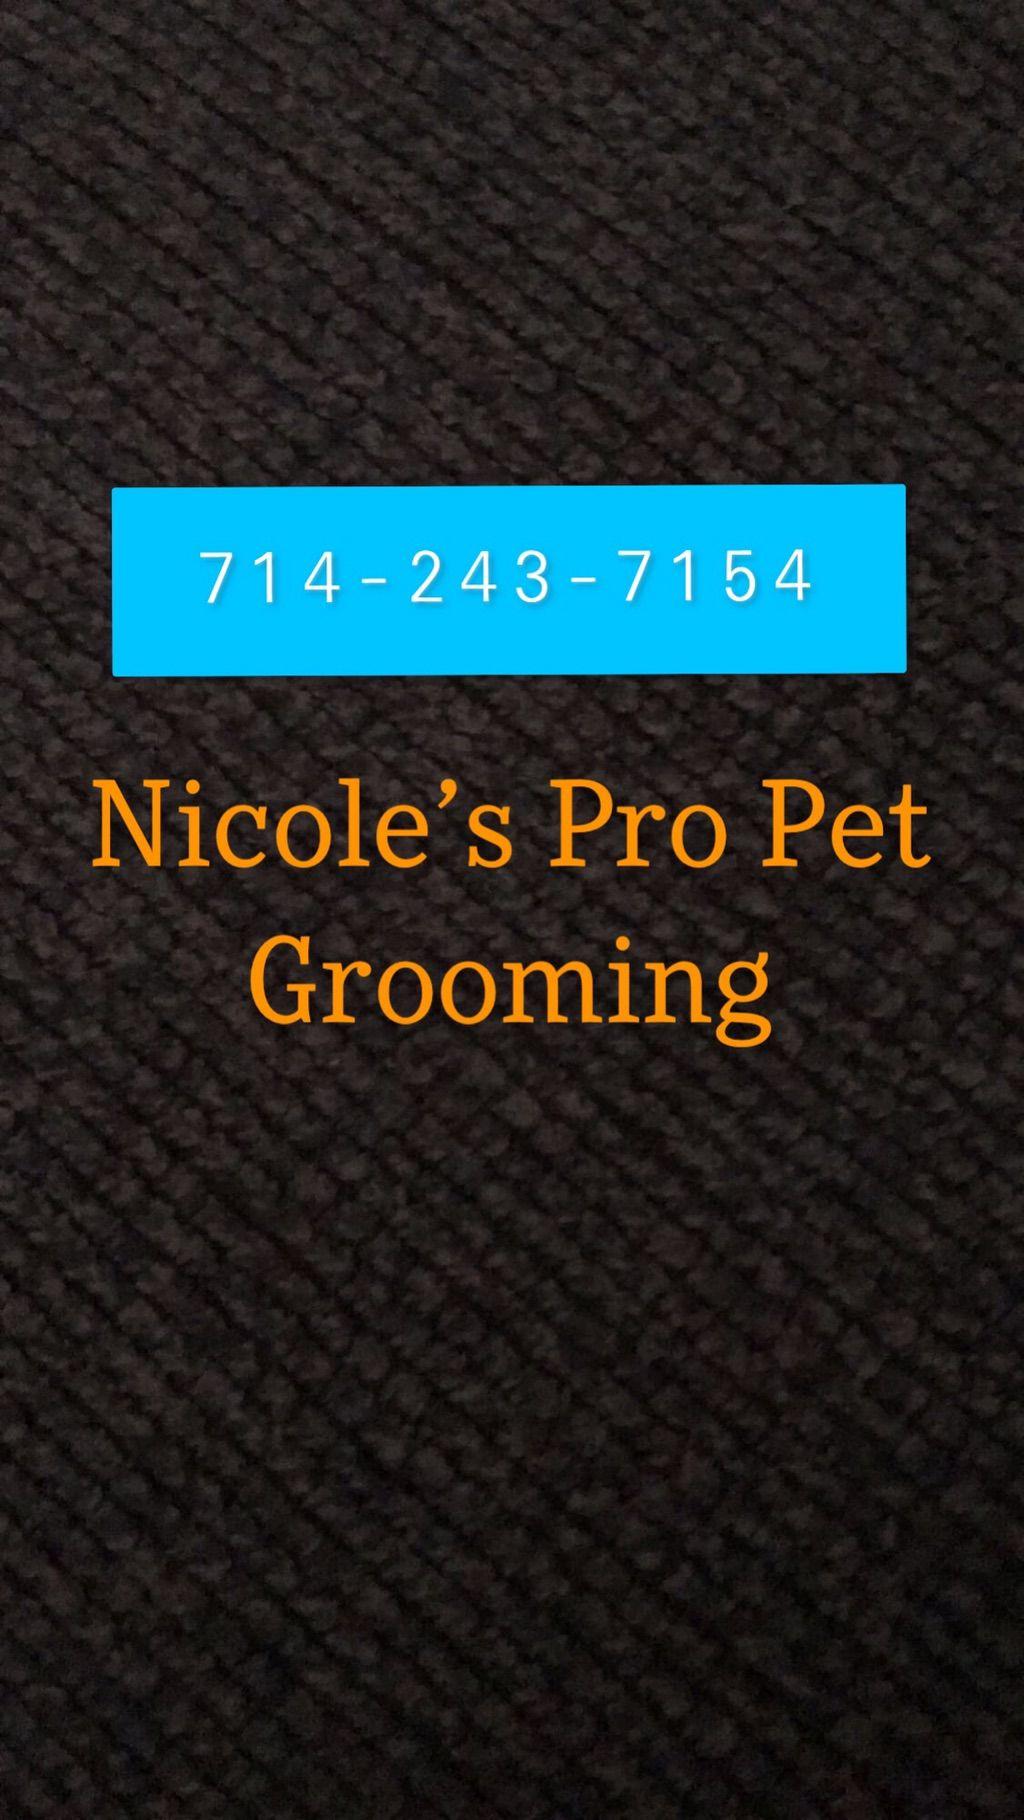 Nicoles Professional Pet Grooming